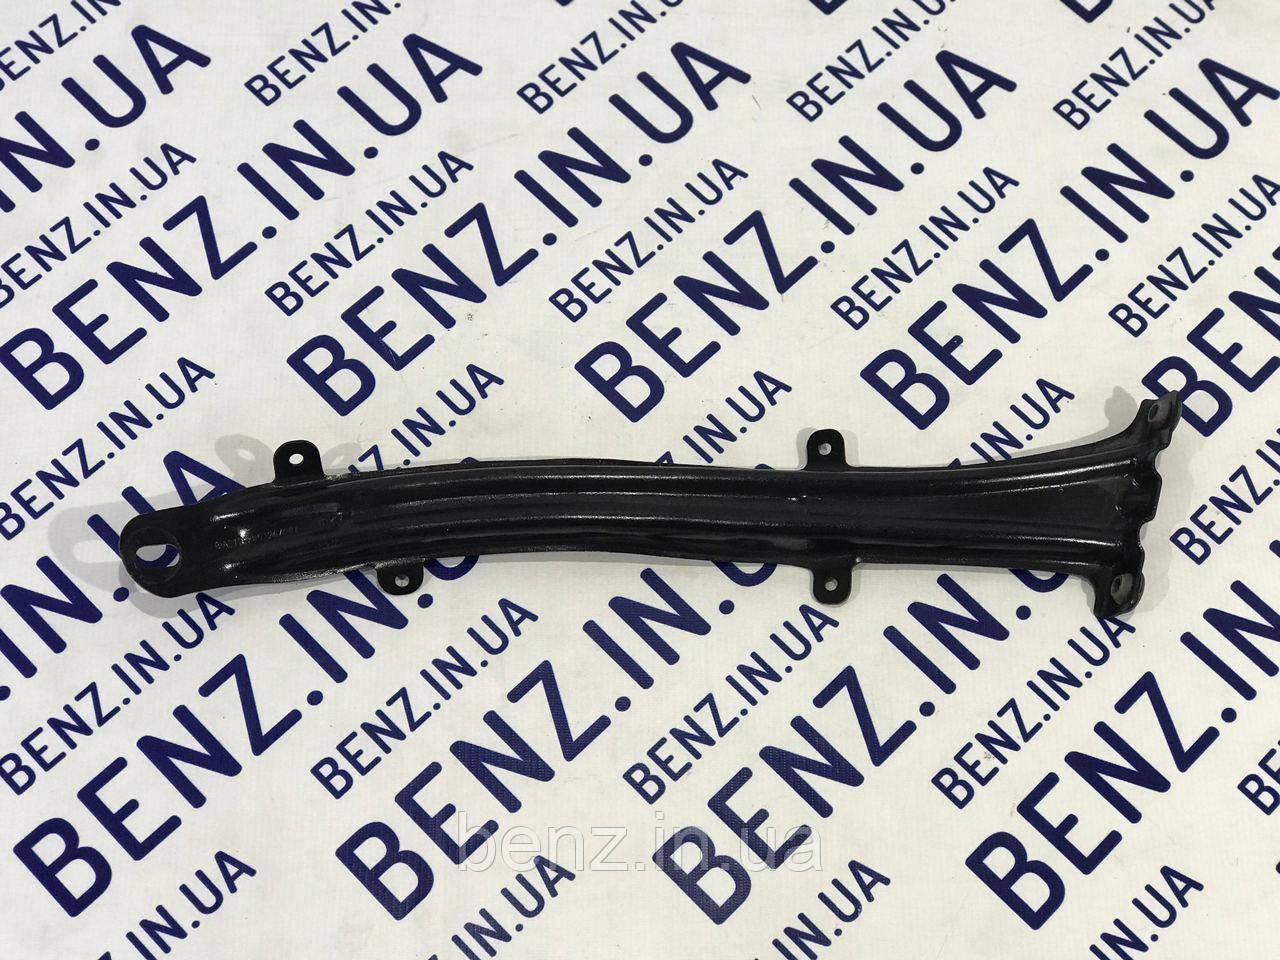 Распорка переднего амортизатора Mercedes W212/S212 A2126280124